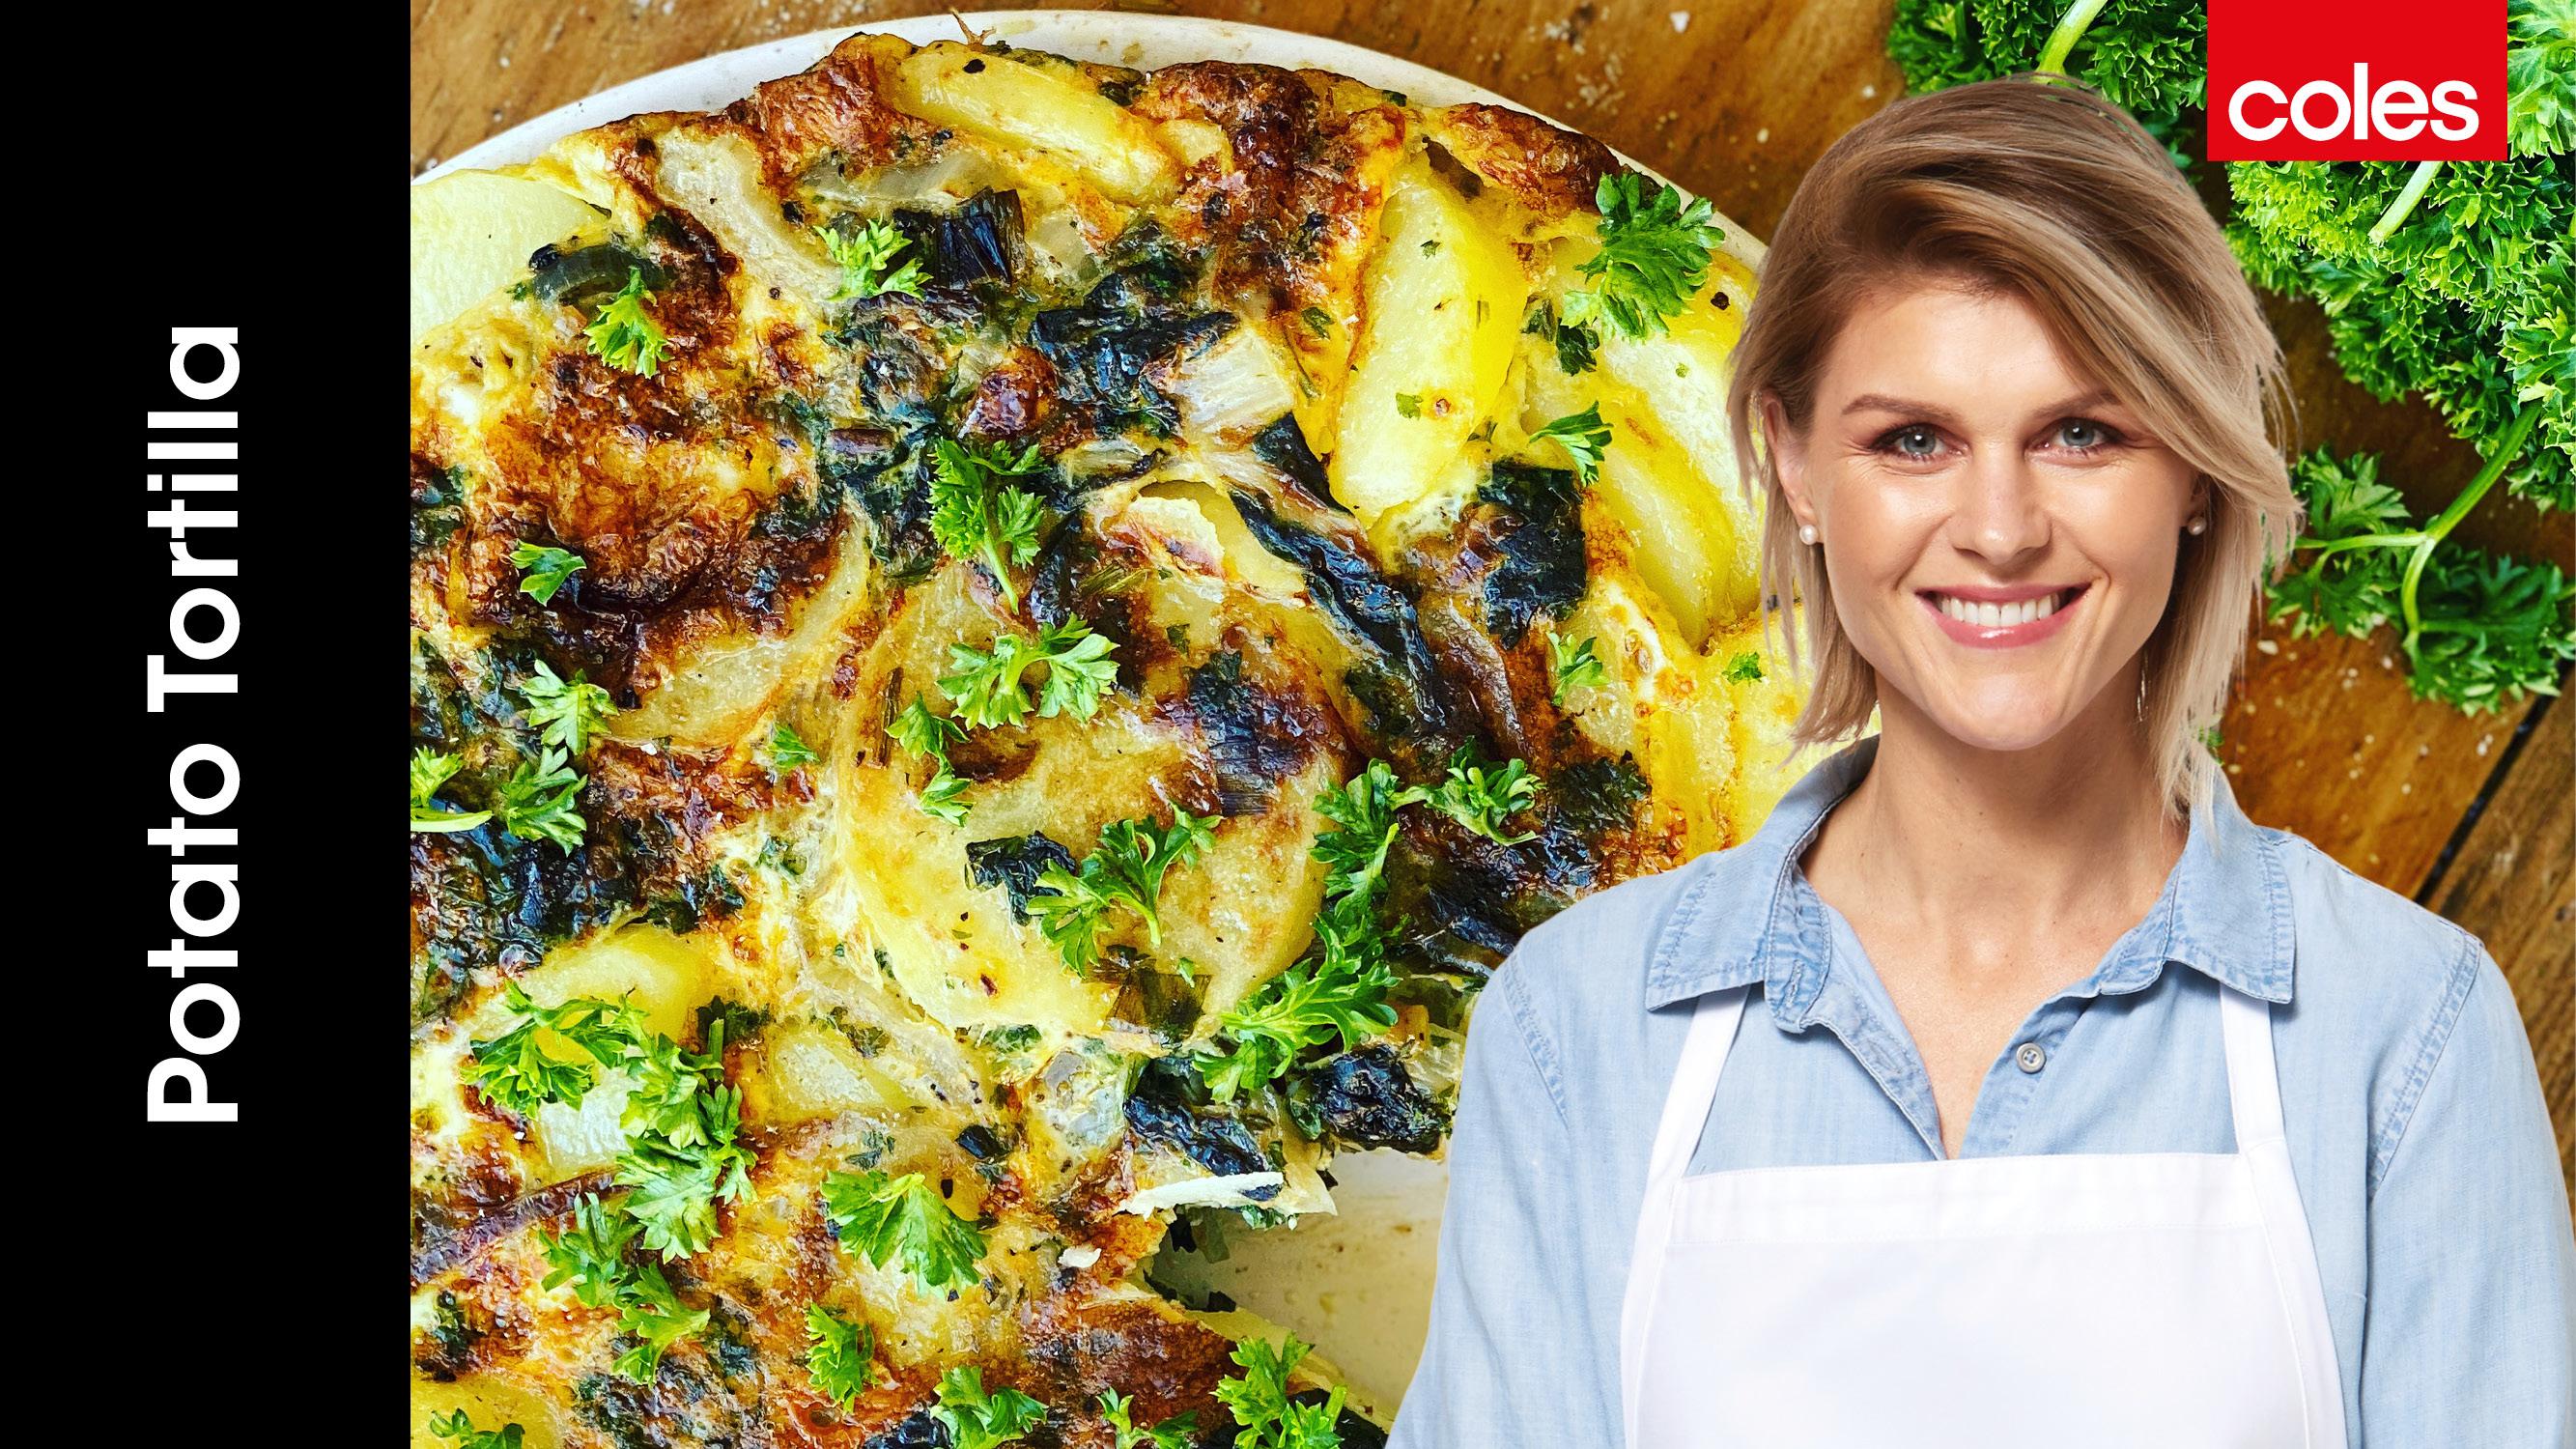 Courtney Roulston Potato Tortilla Cooking Video